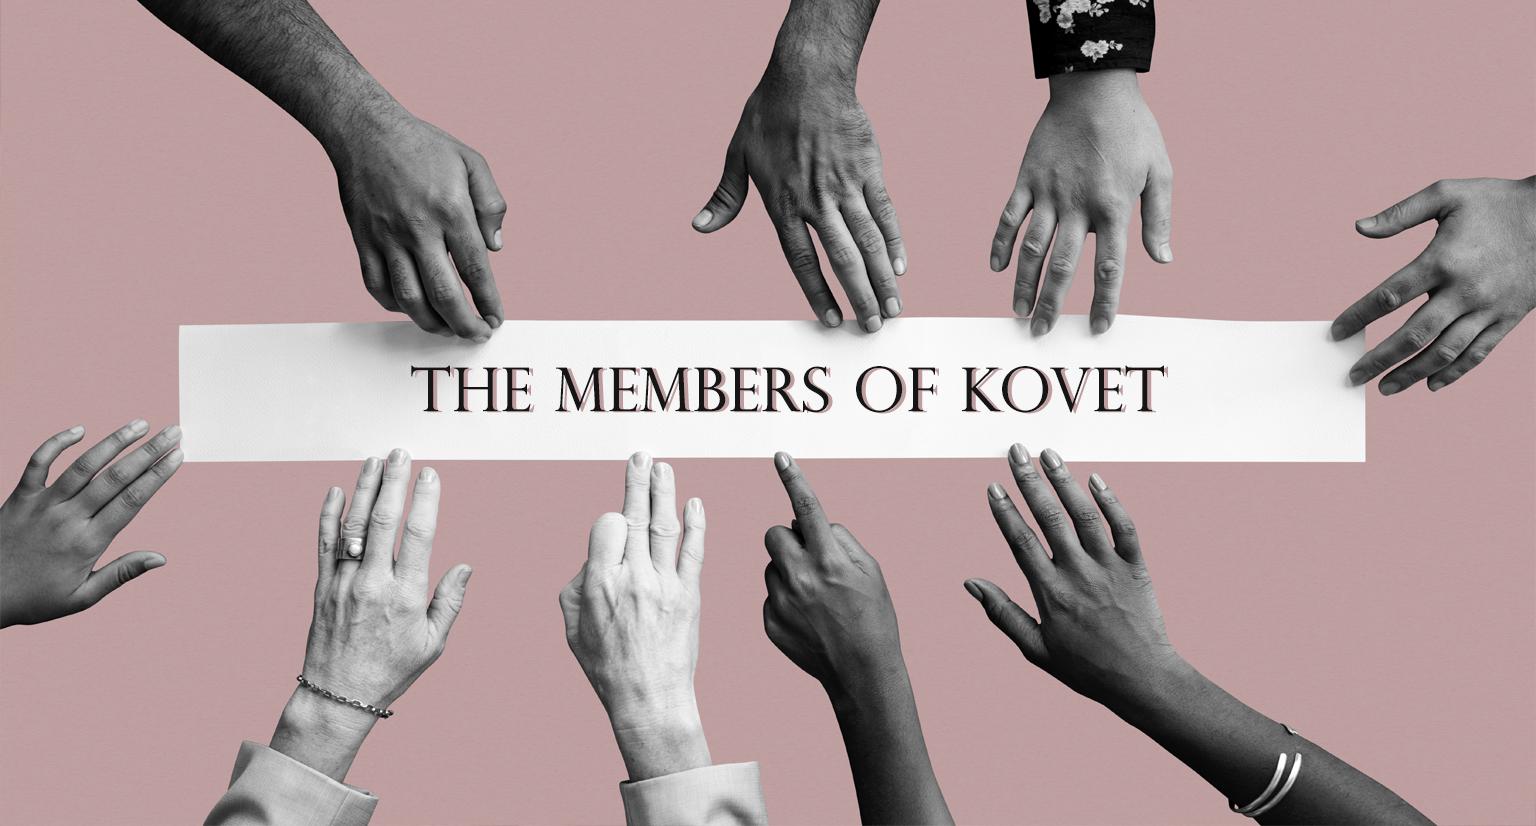 The Key Members of Kovet